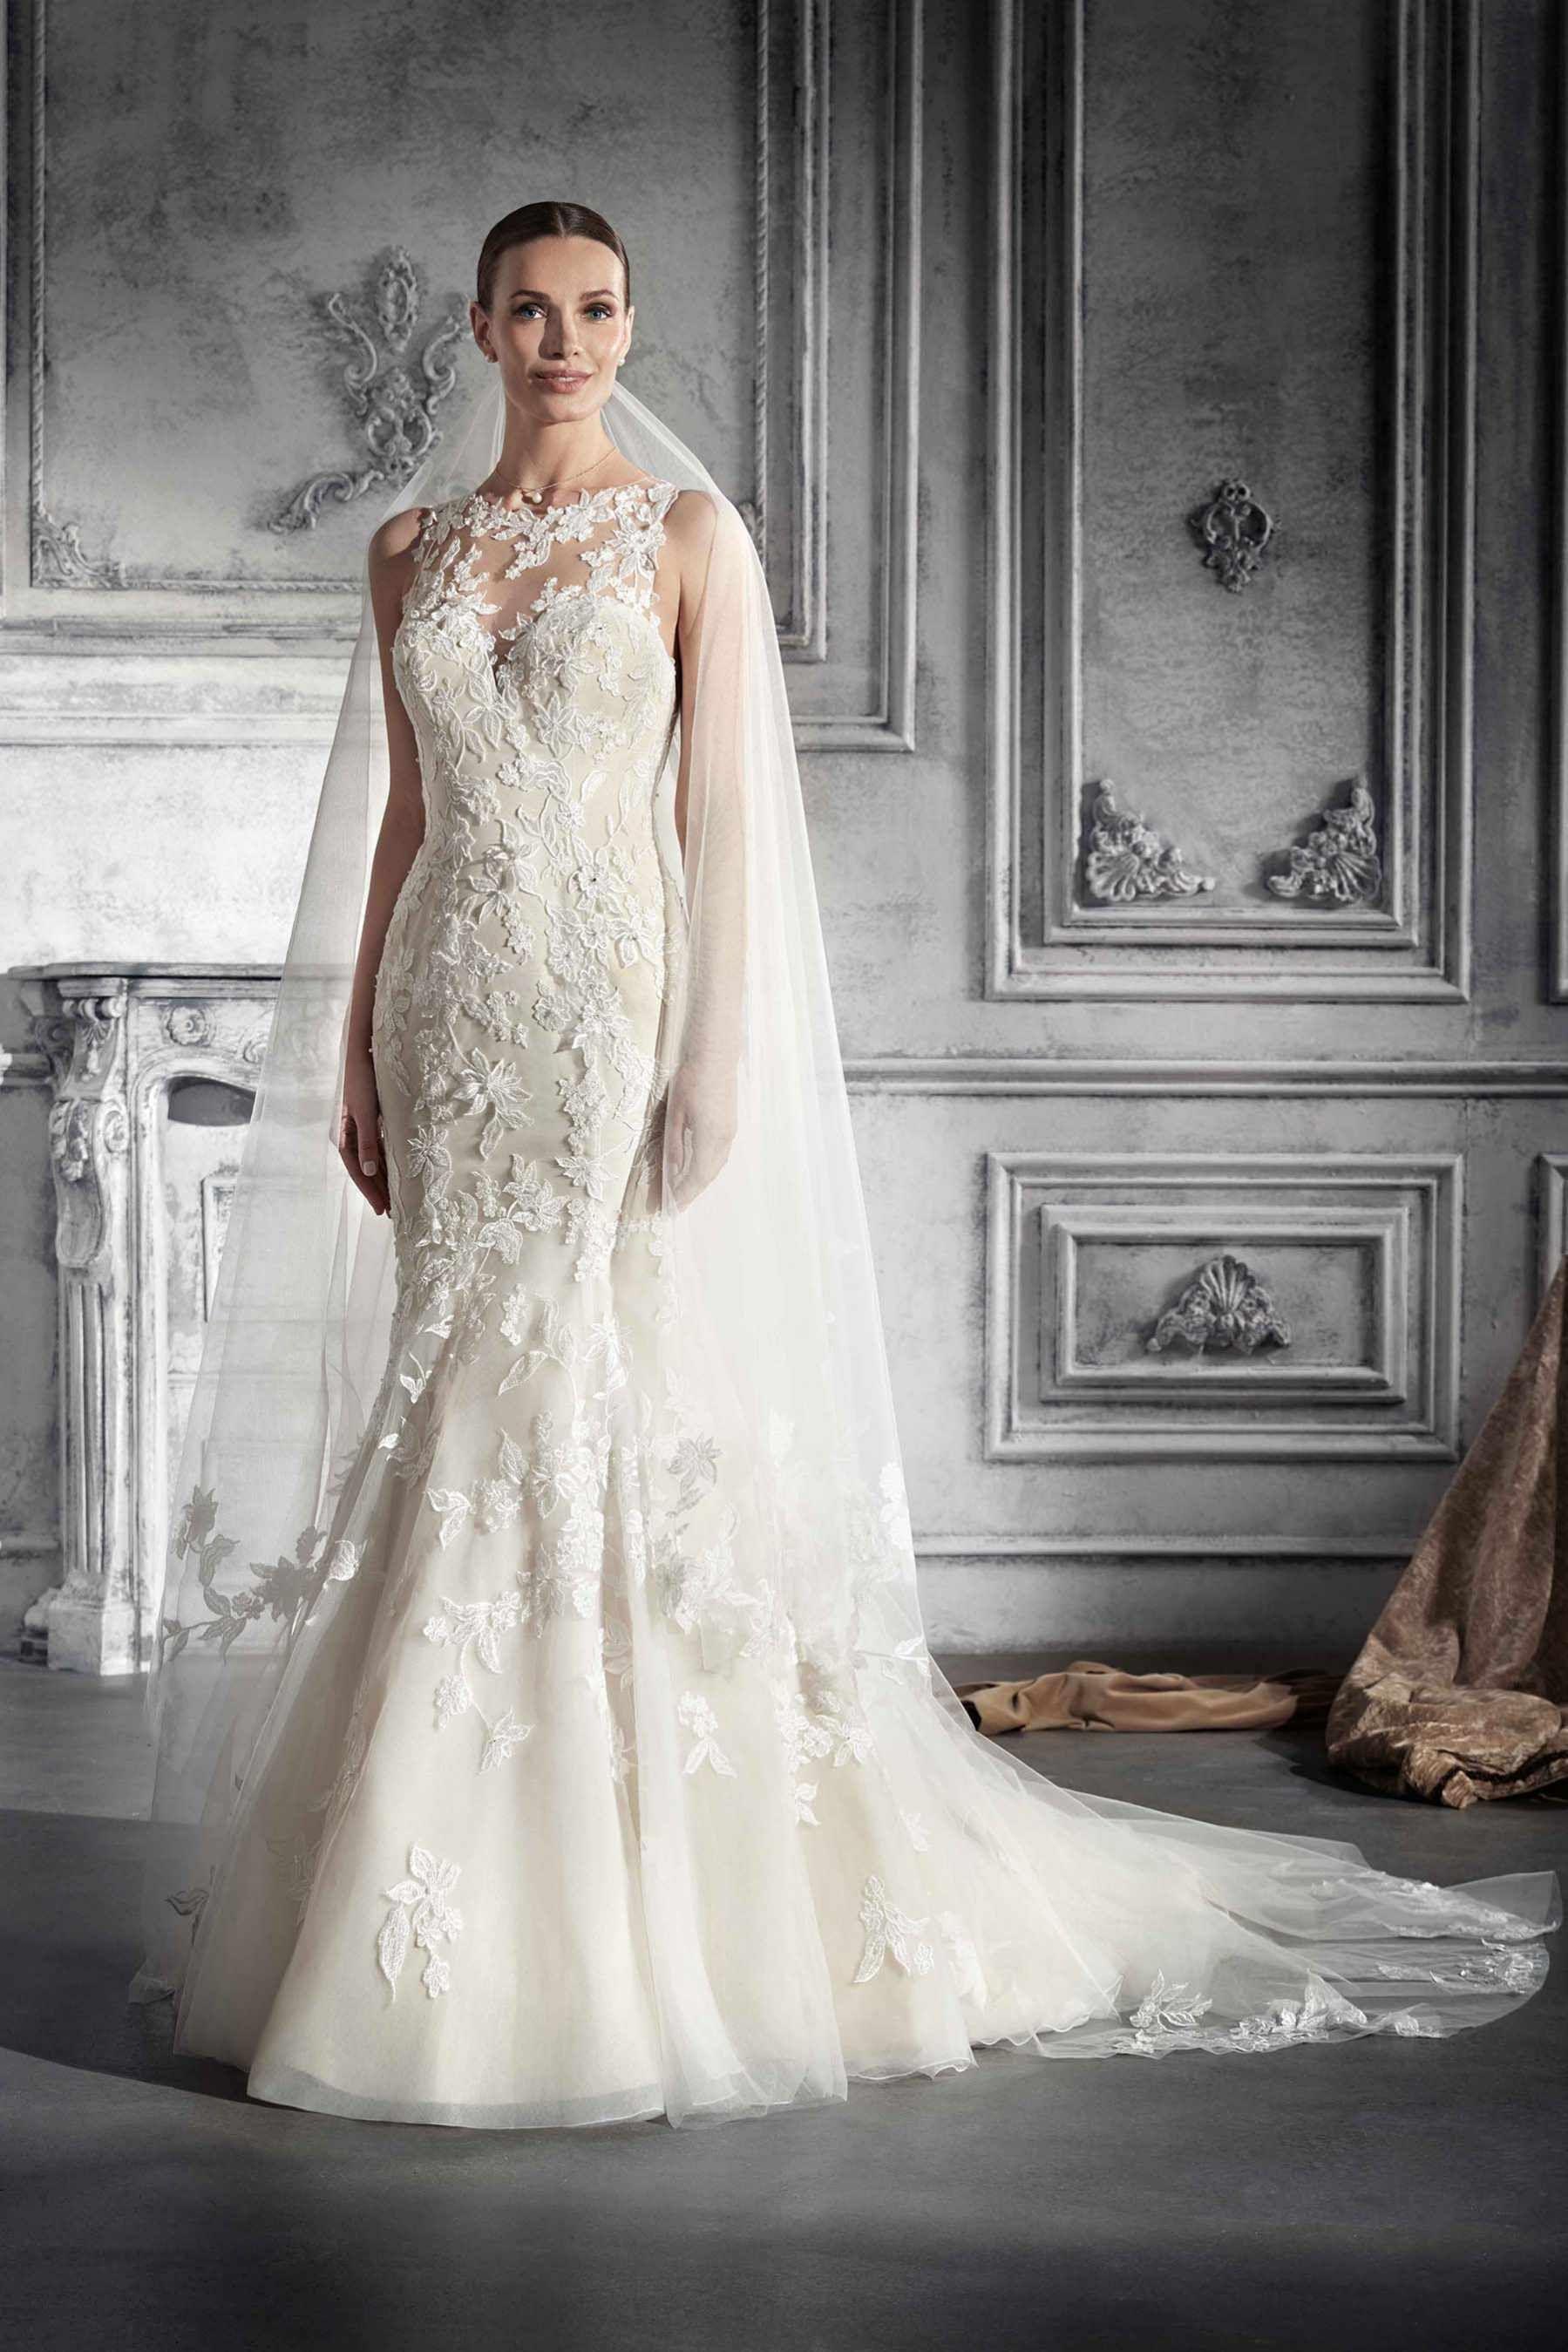 d391b04e0a99 Demetrios Wedding Dress Style 776 Modern femininty takes the spotlight in  this demetrios design. A